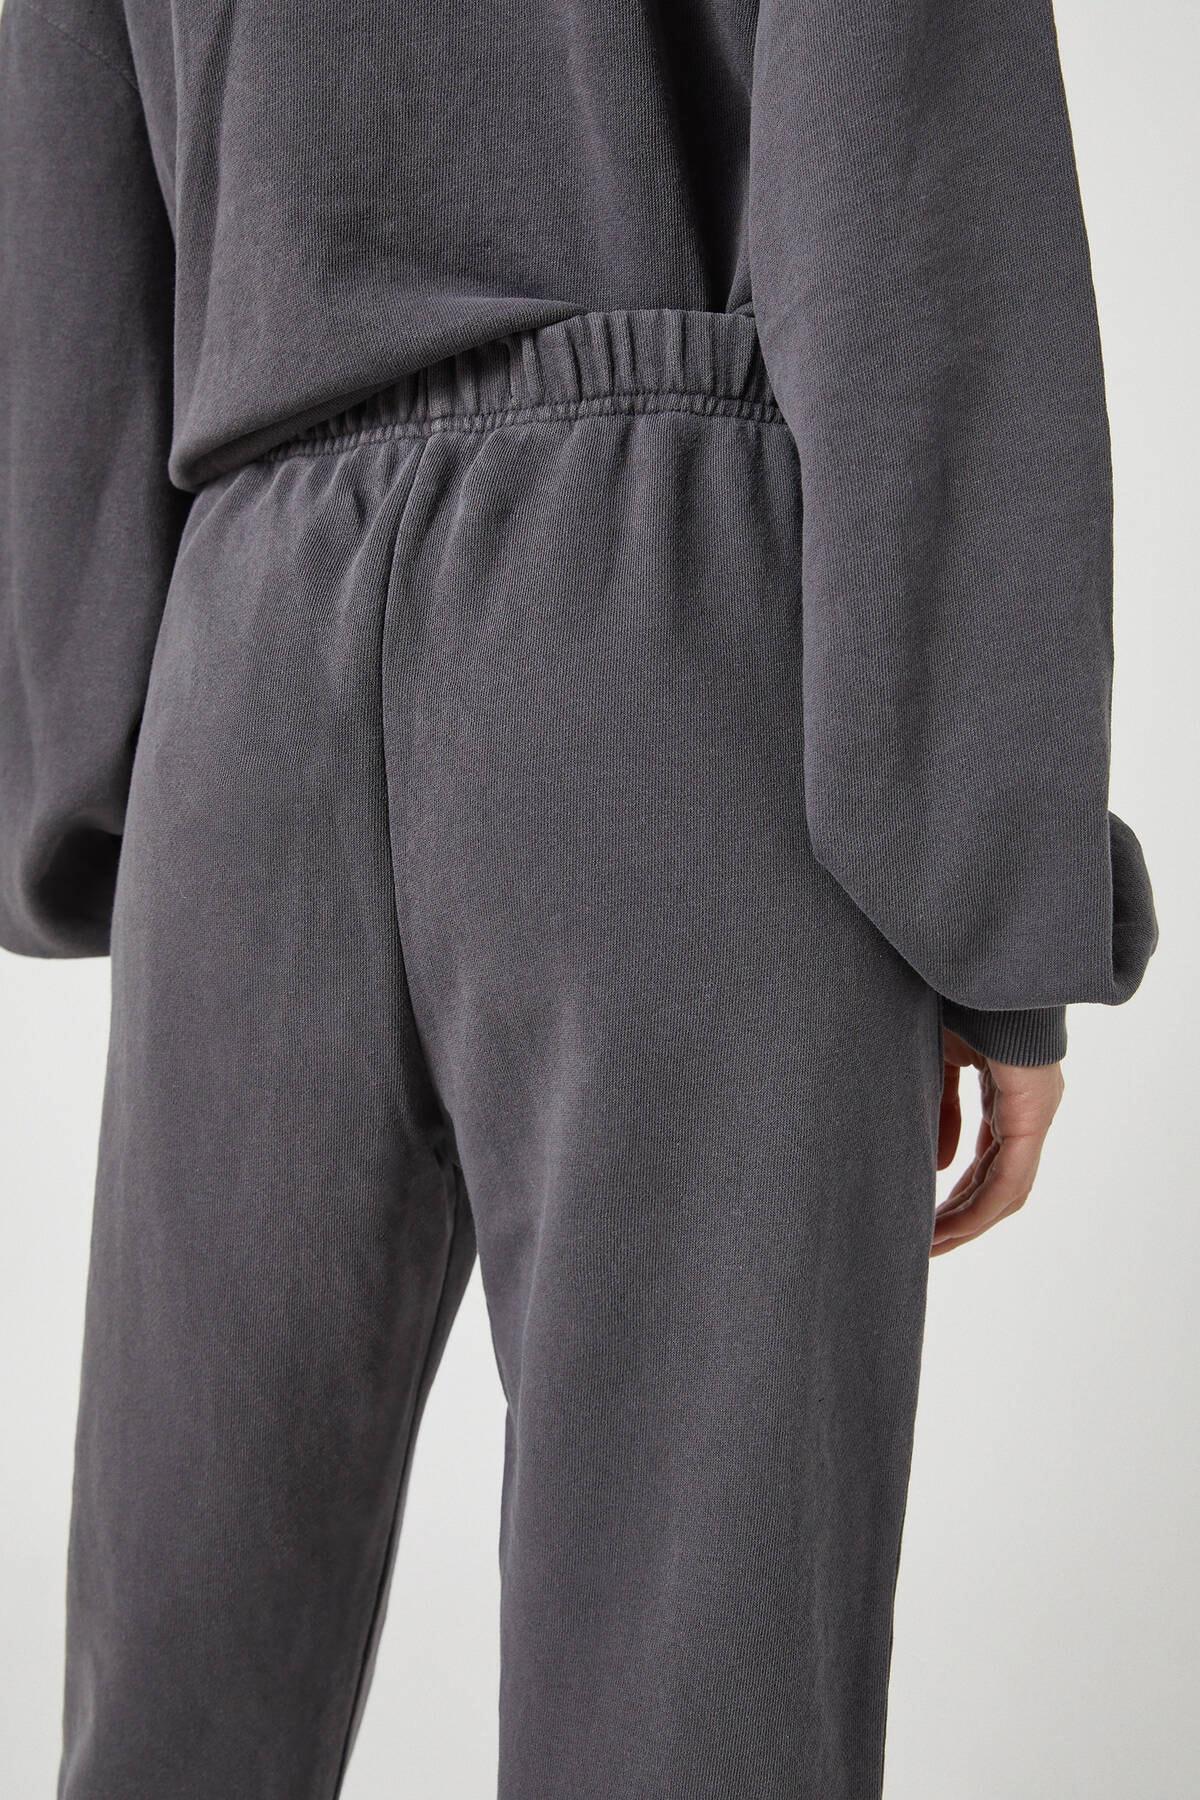 Pull & Bear Kadın Antrasit Gri Soluk Efektli Jogging Fit Pantolon 09678390 2